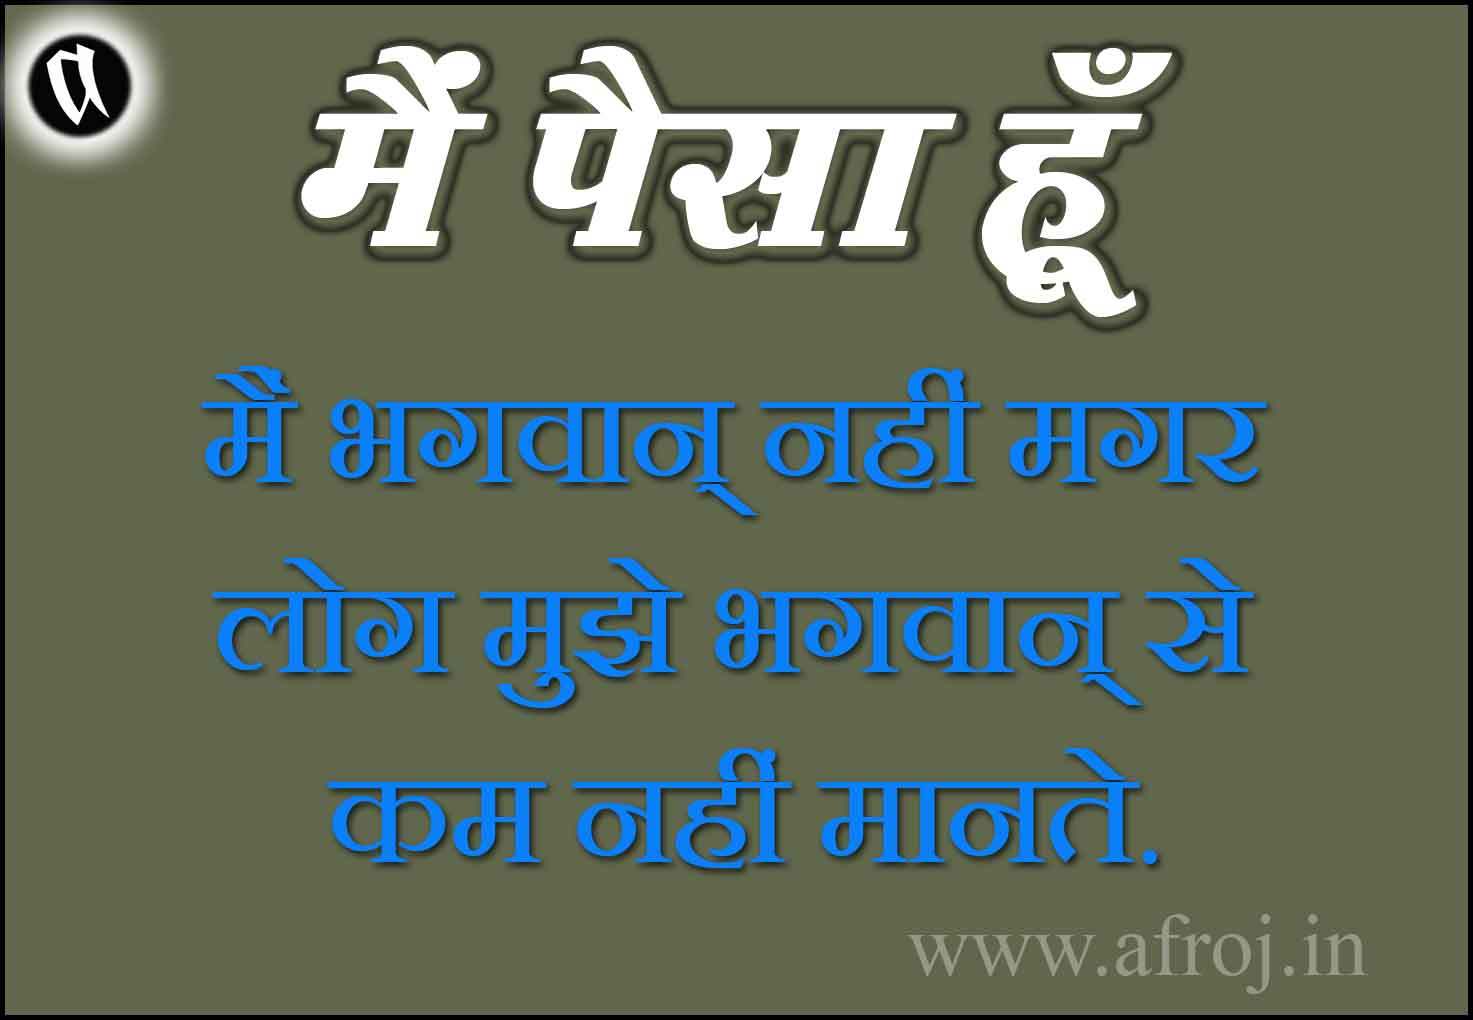 Money Quotes in Hindi: मैं पैसा हूँ - Afroj.In